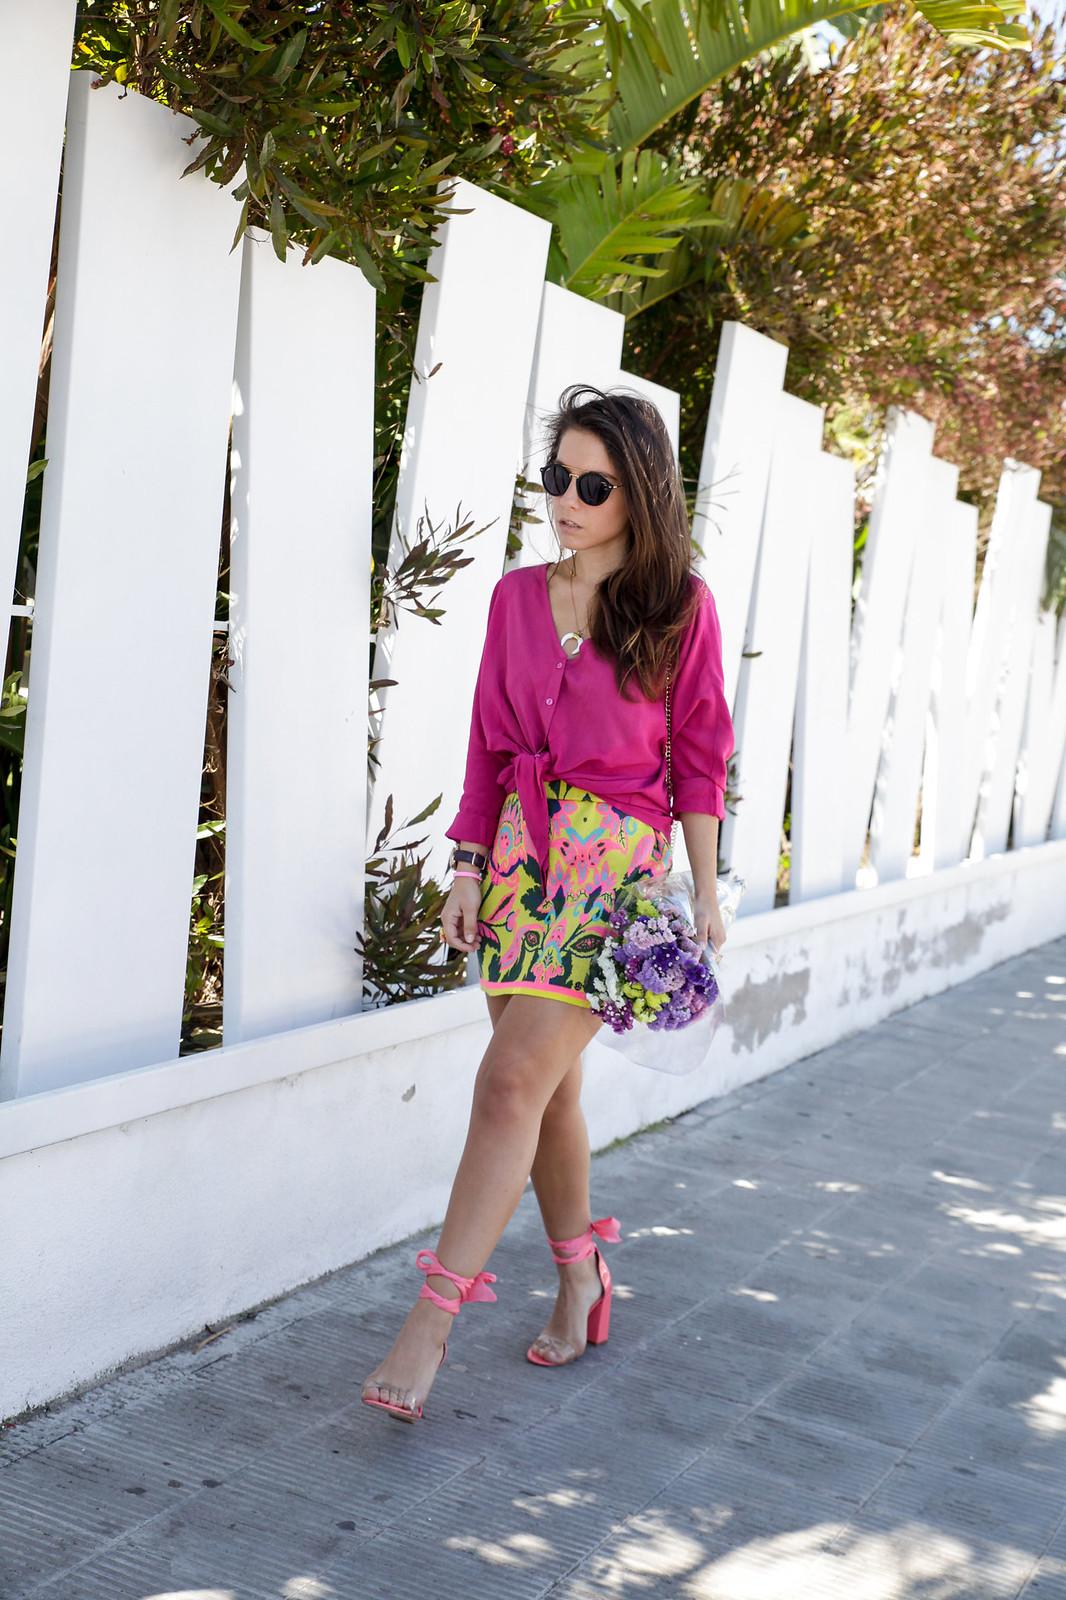 05_blusa_magenta_falda_amarilla_outfit_ruga_summer17_theguestgirl_influencer_barcelona_portugal_brand_ambassador